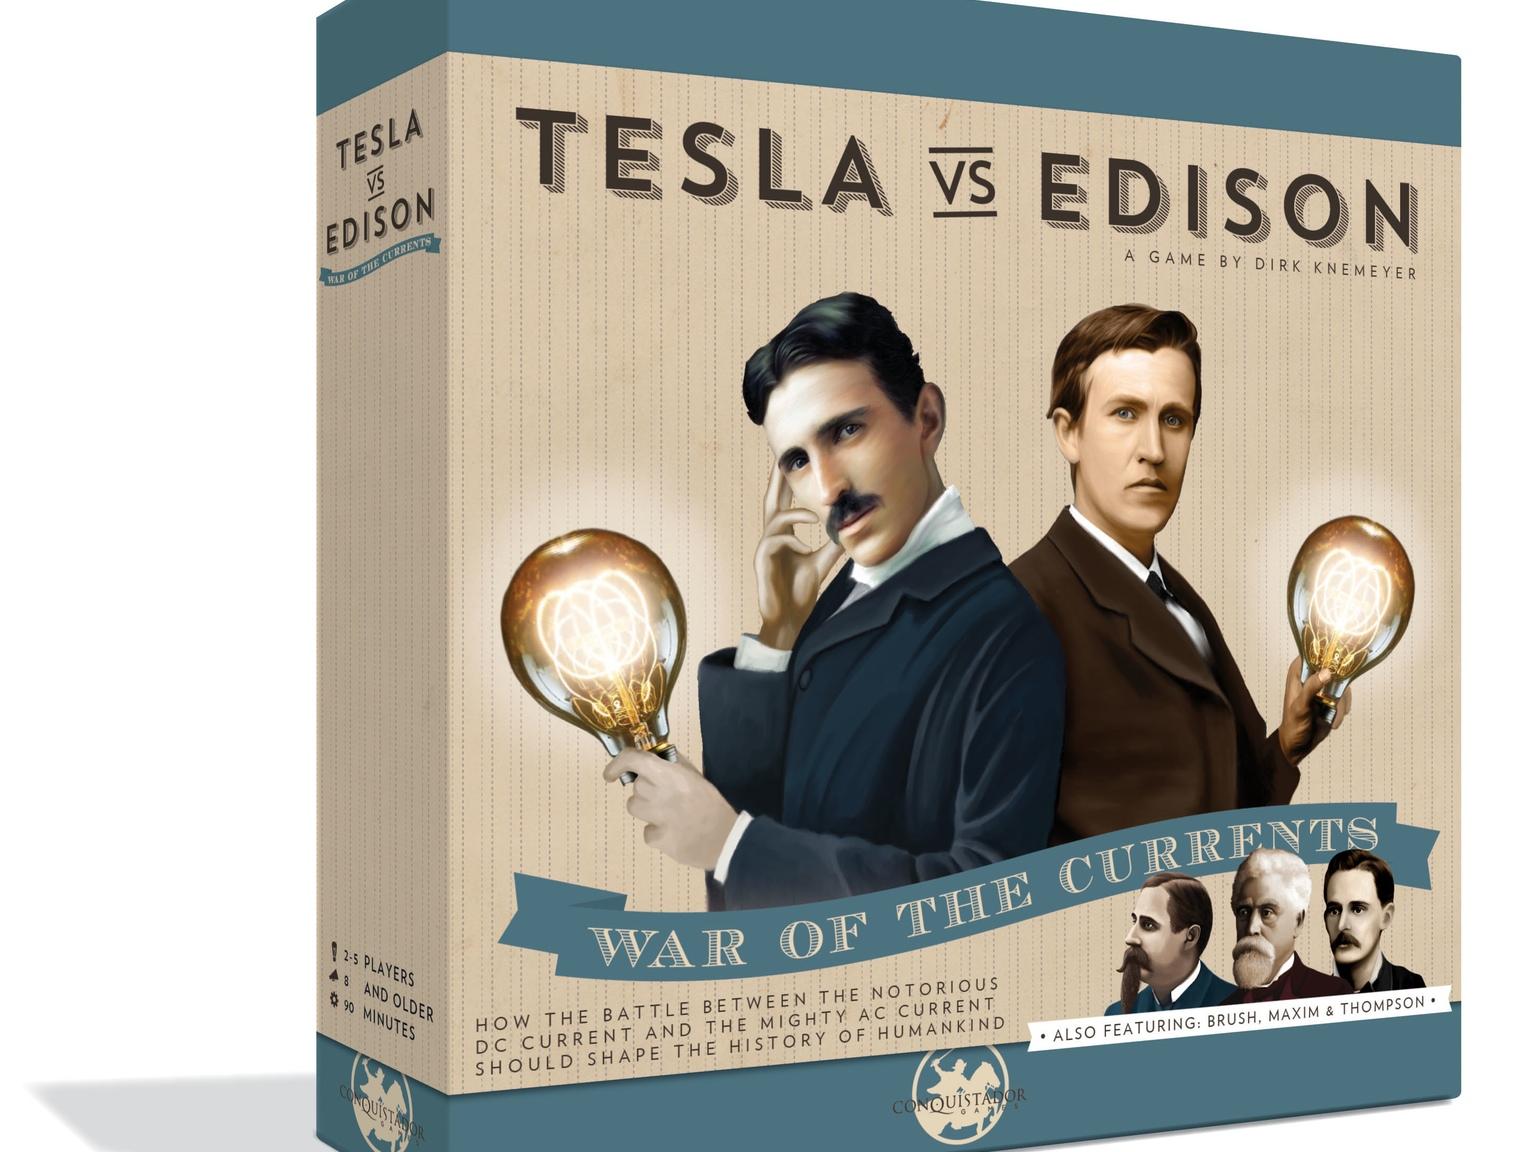 Amazon.com: Tesla vs. Edison: Toys & Games